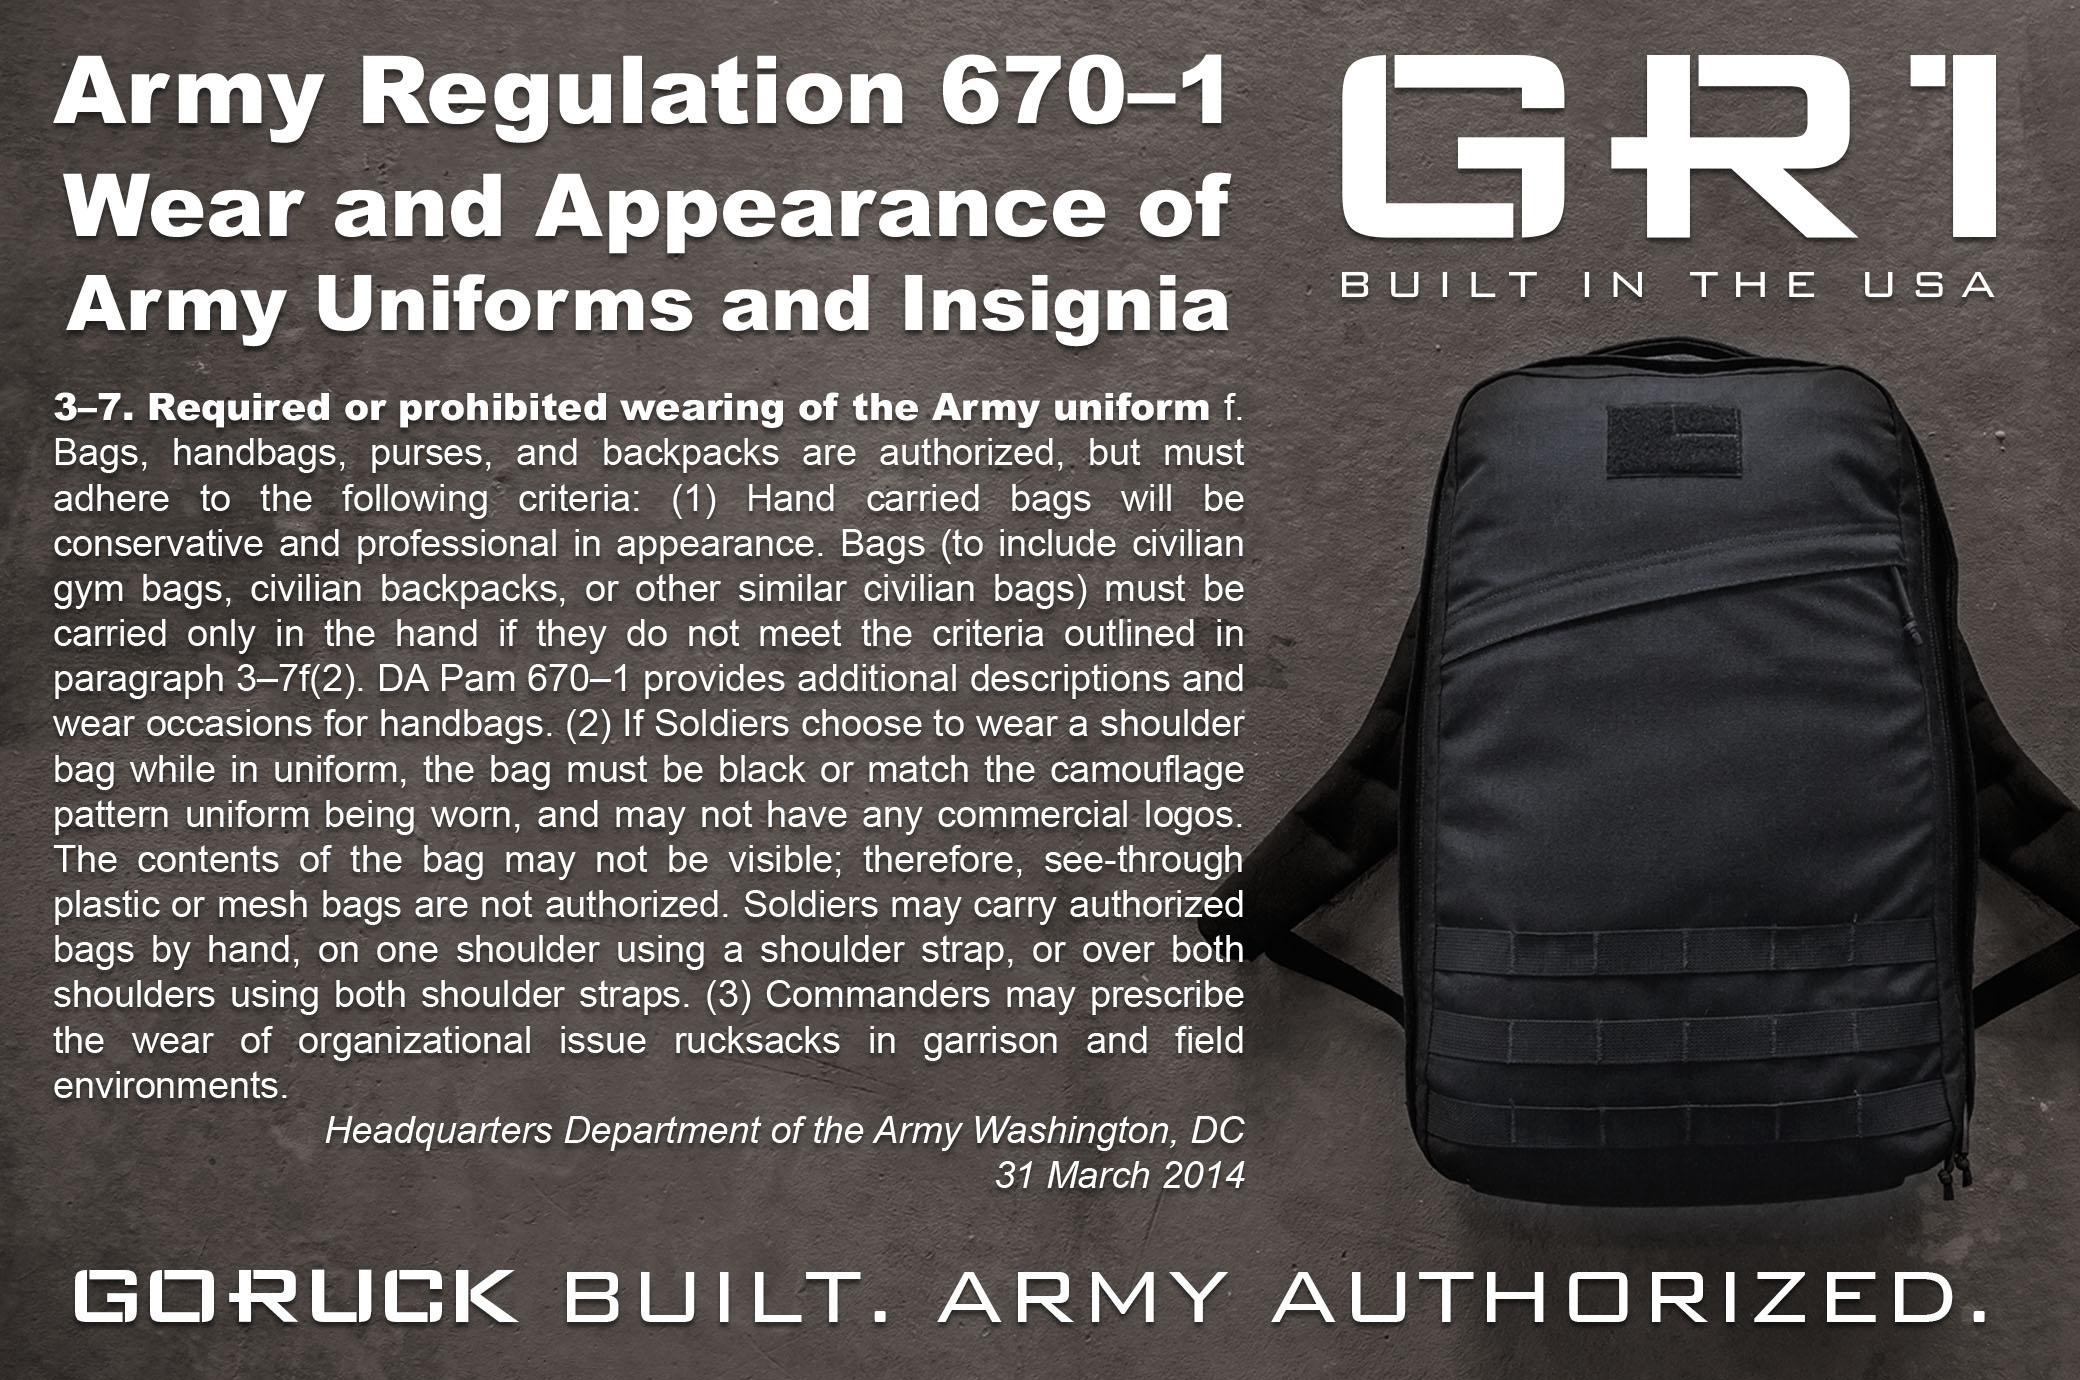 GR1_670-1